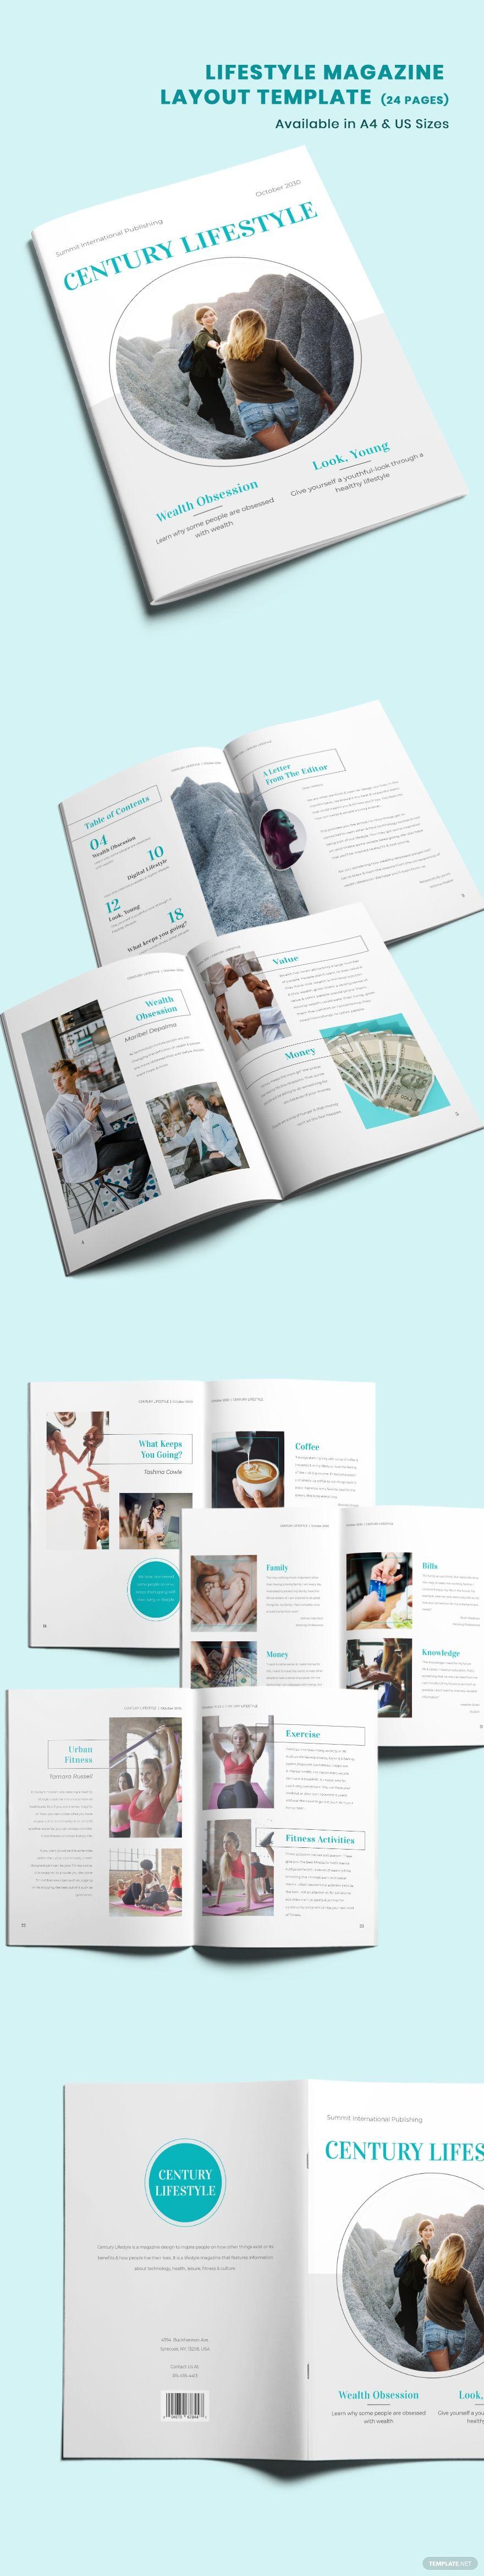 Lifestyle Magazine Layout Template #AD, , #Paid, #Magazine, #Lifestyle, #Template, #Layout